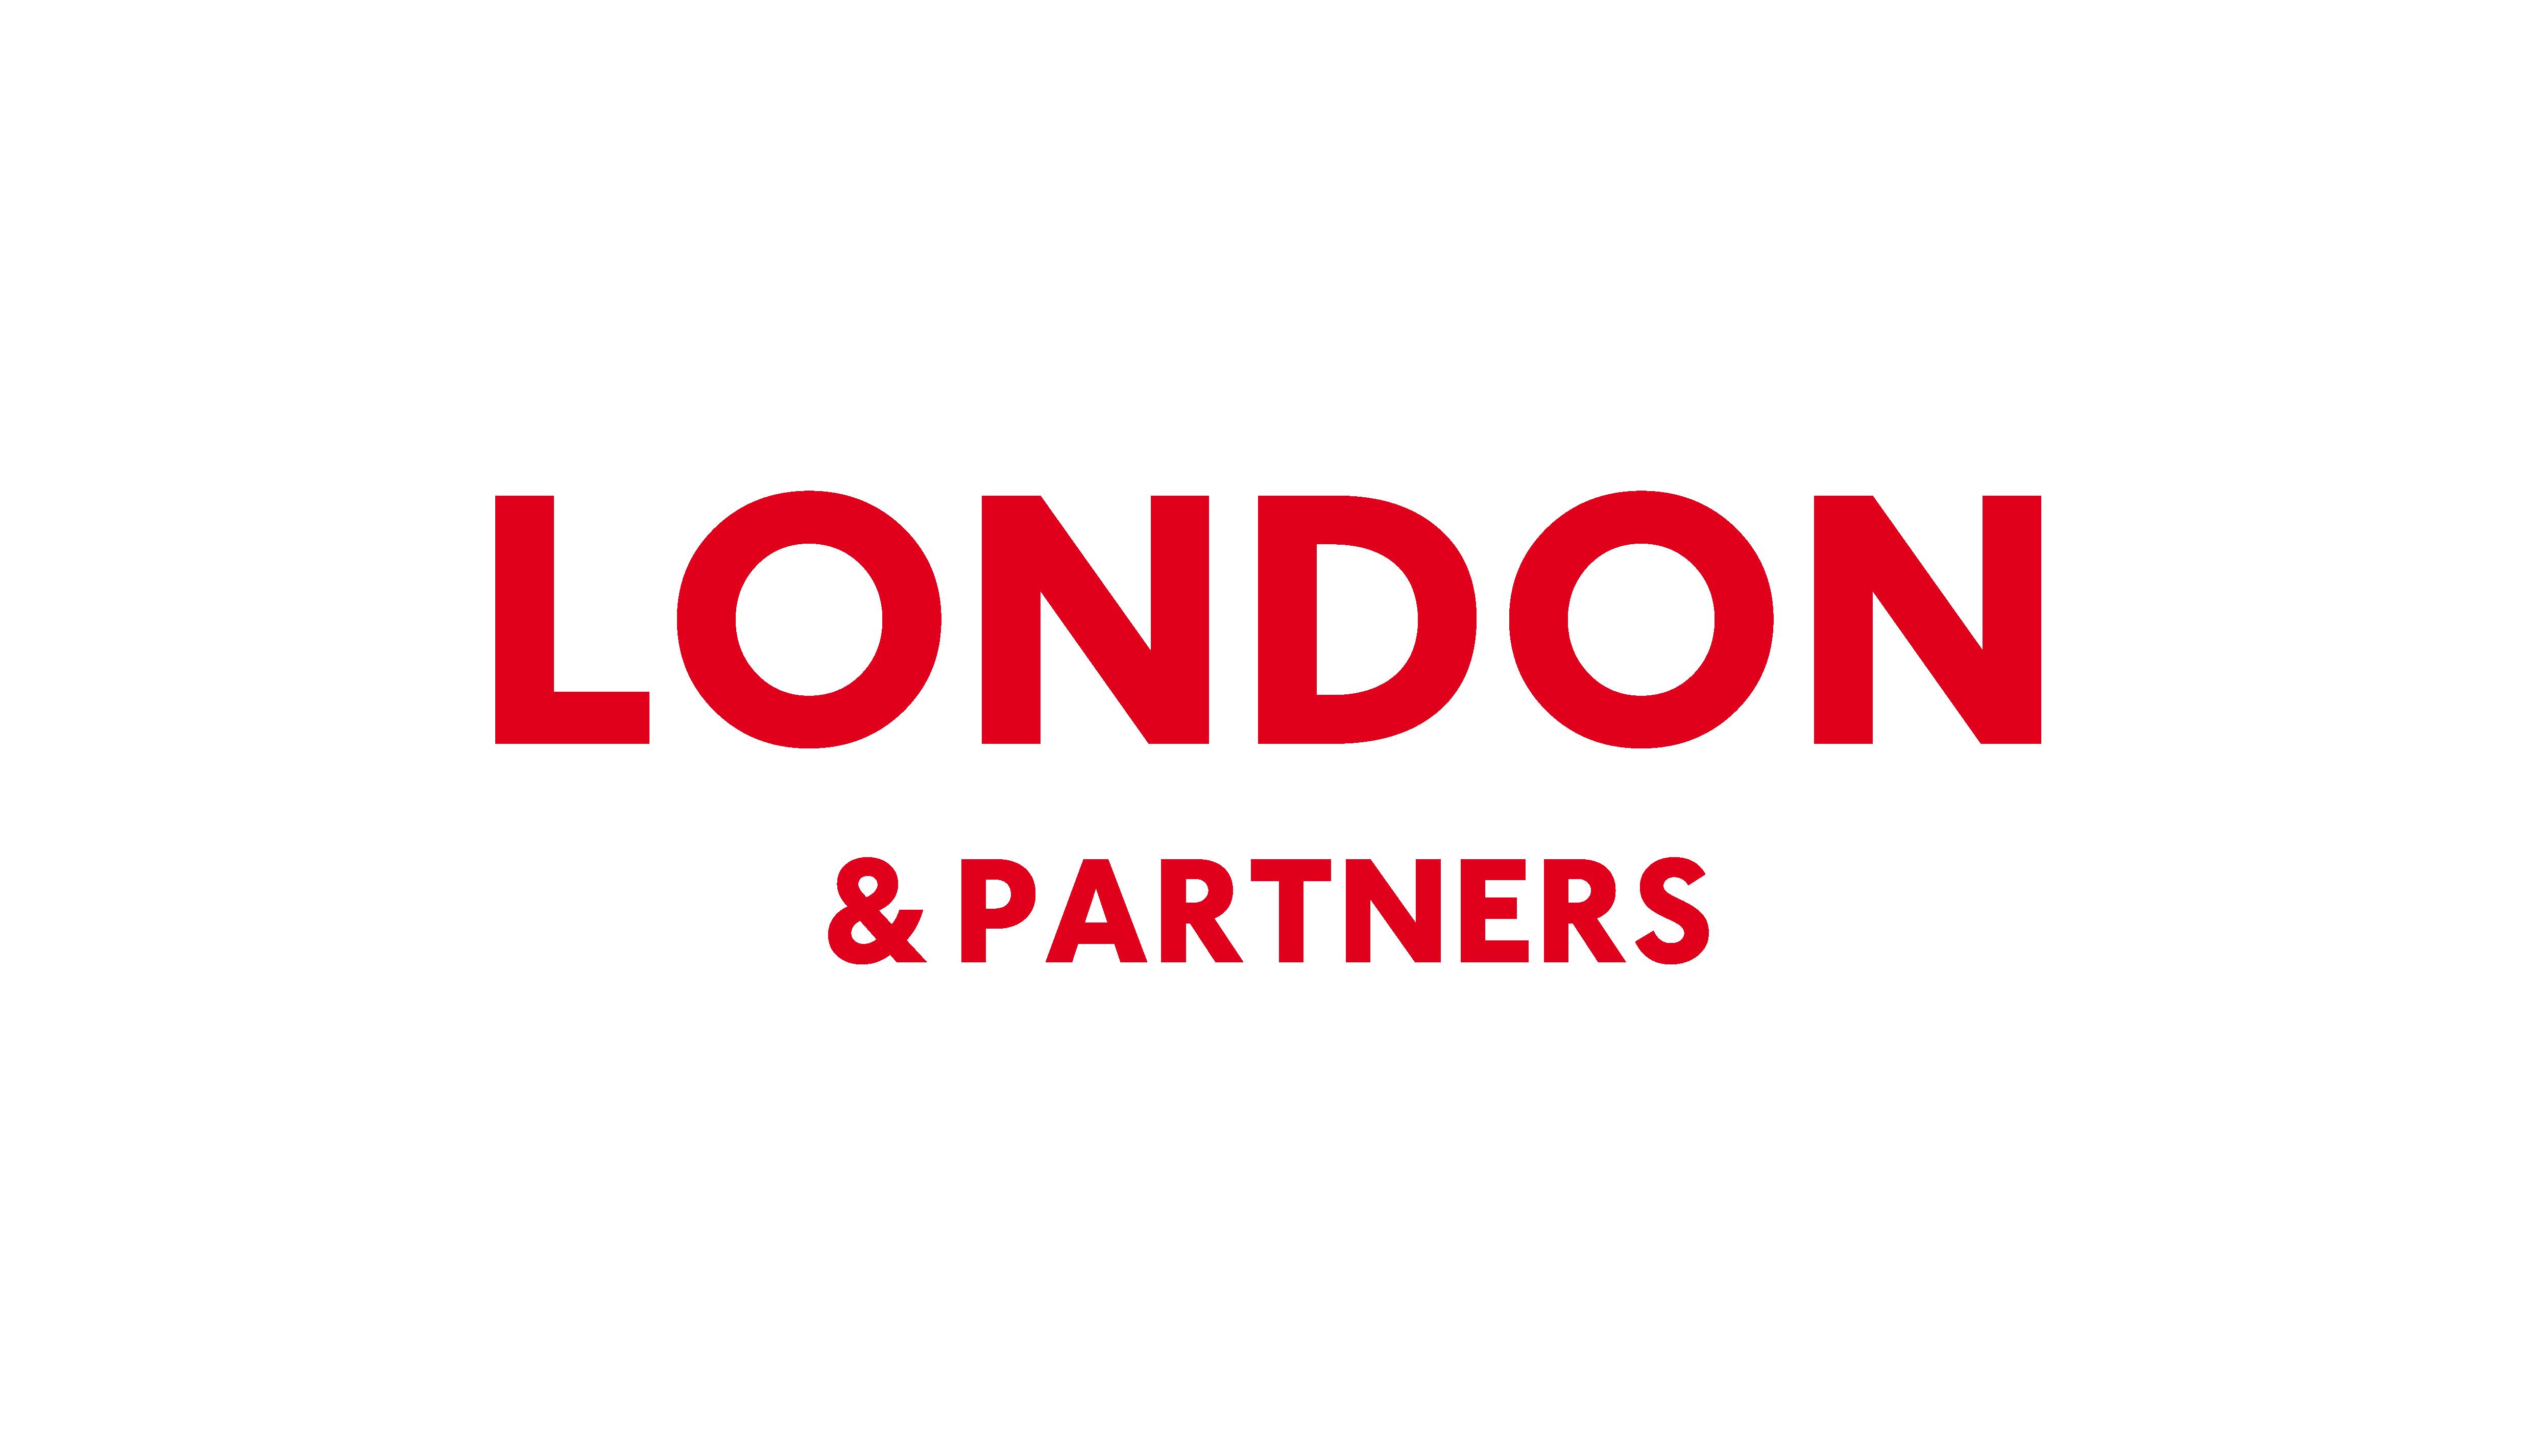 London & Partners's logo